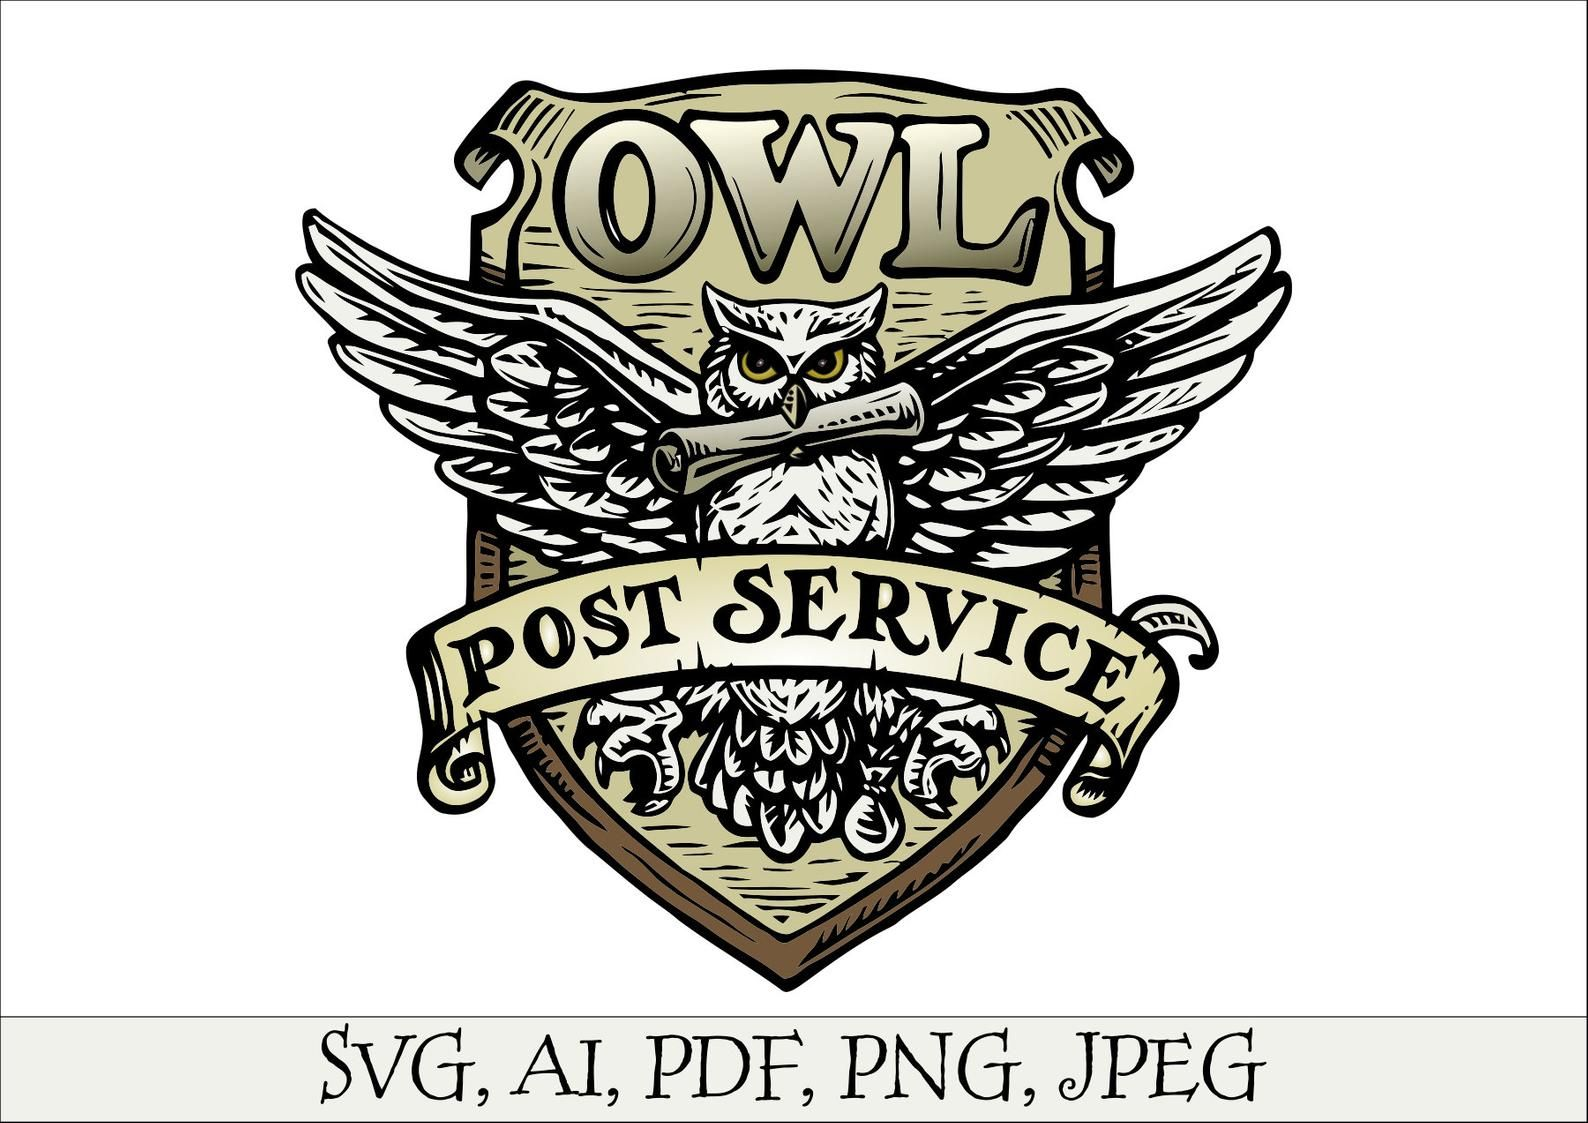 Owl post service SVG, Harry Potter universe, Hedwig owl